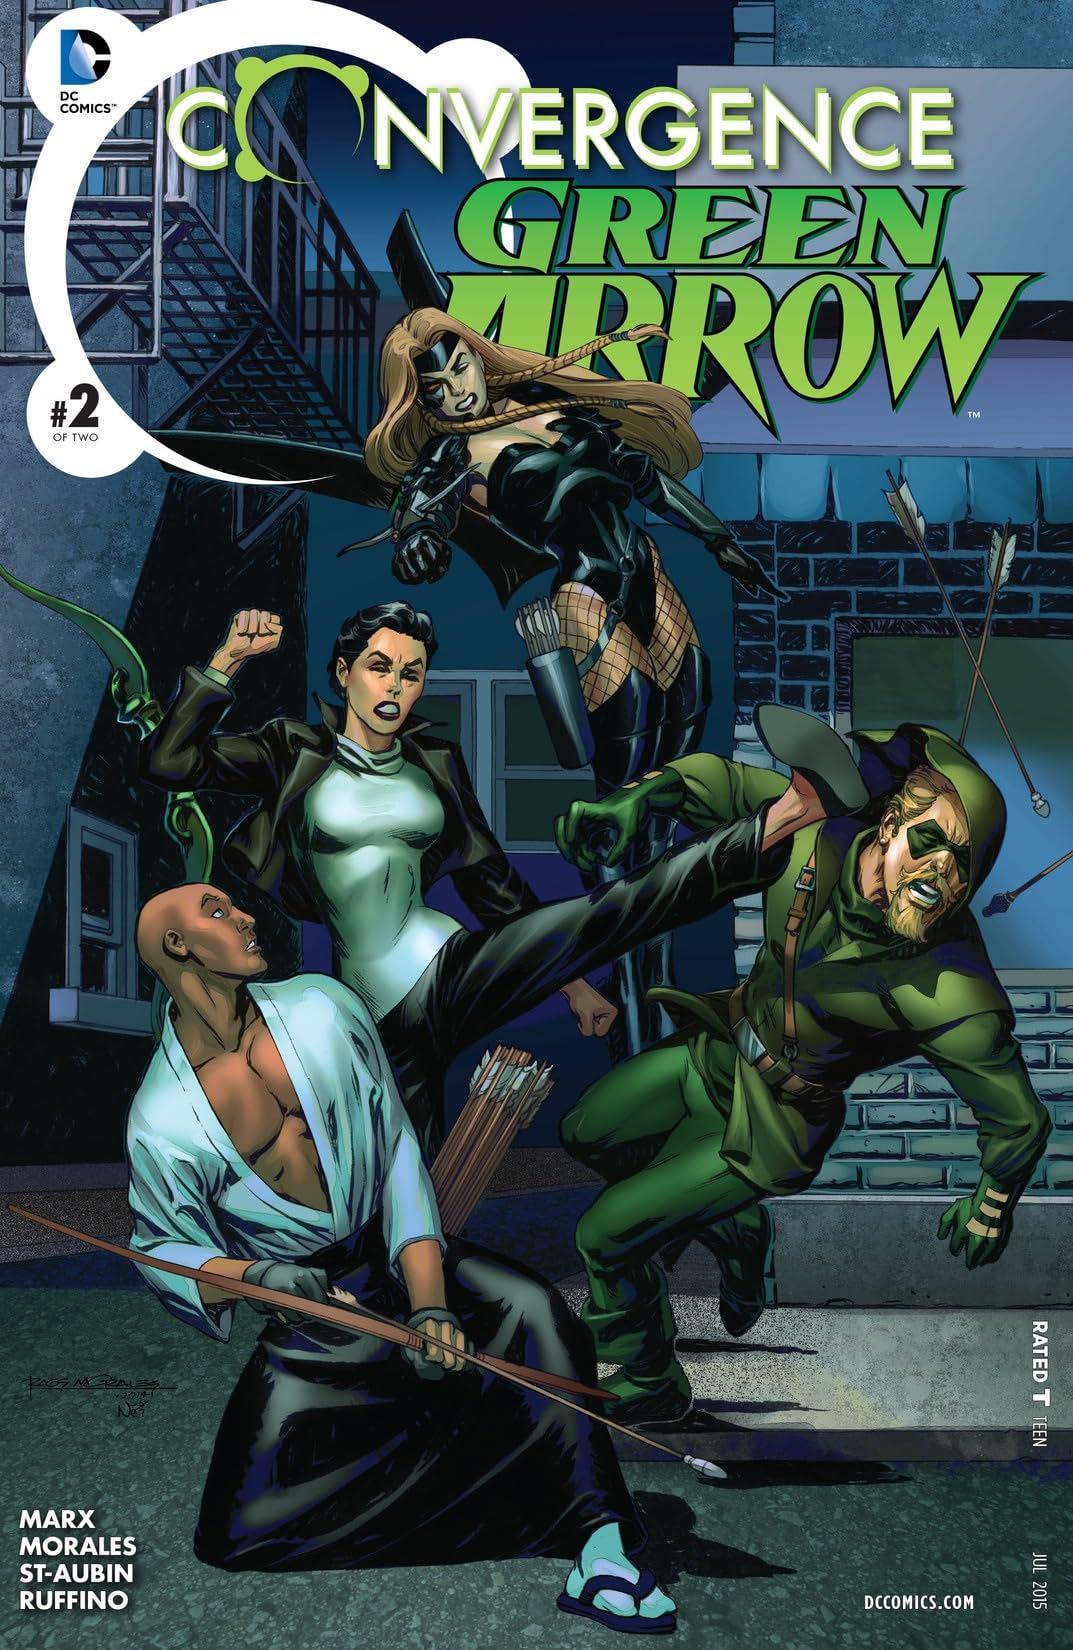 Convergence: Green Arrow (2015) #2